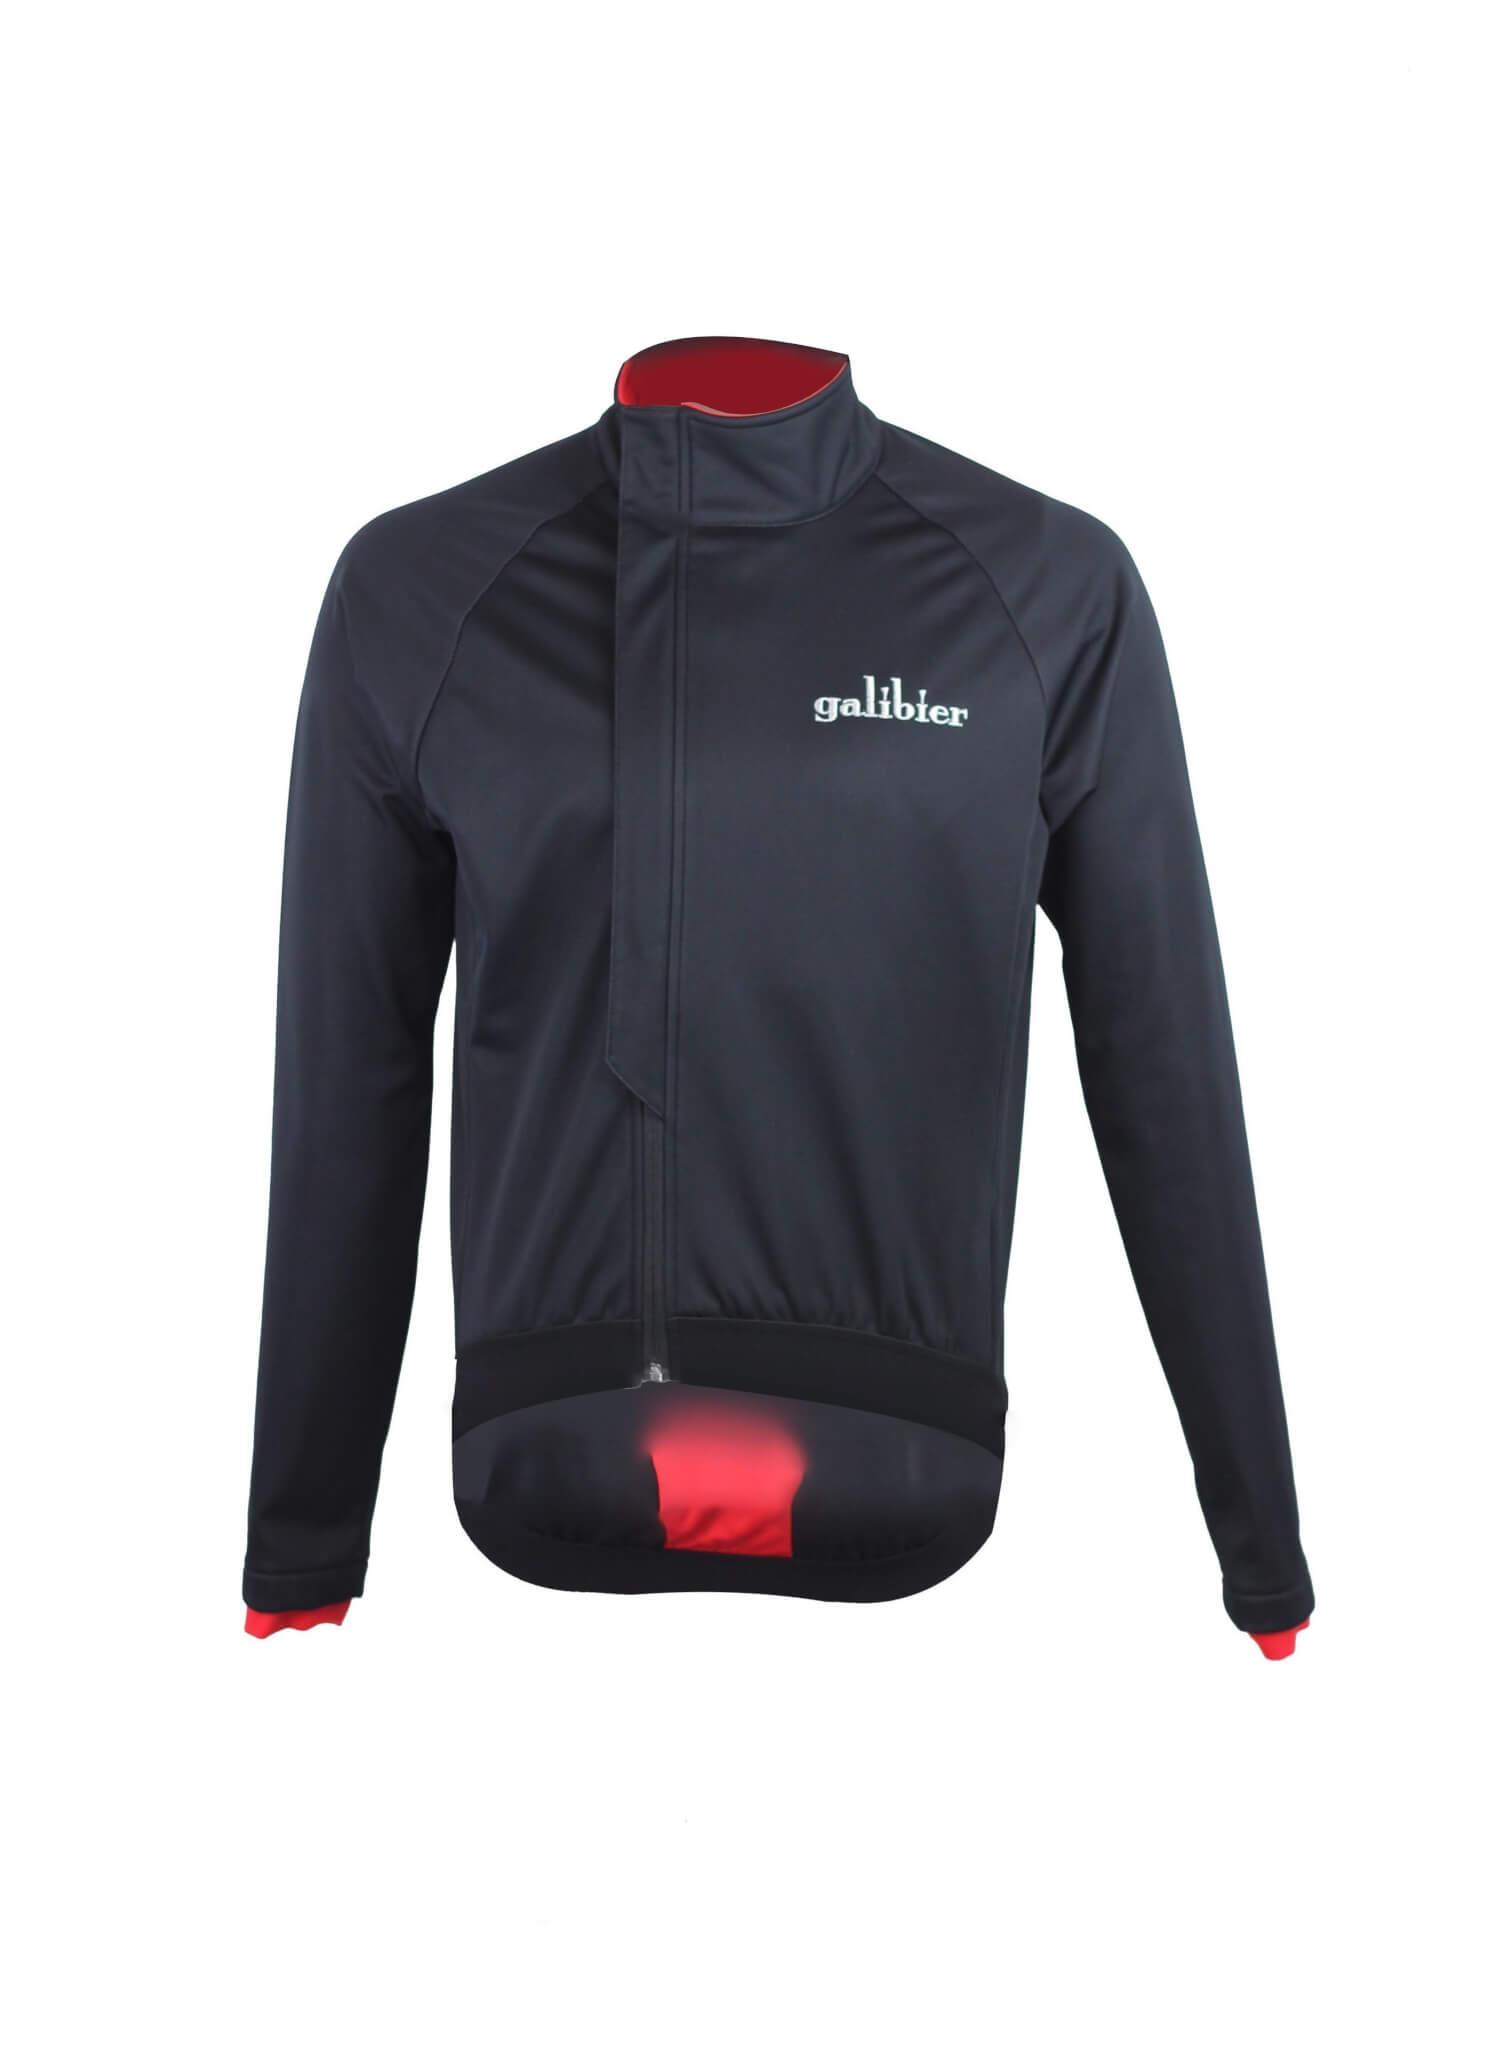 c41f5a099 Mistral Pro Jacket